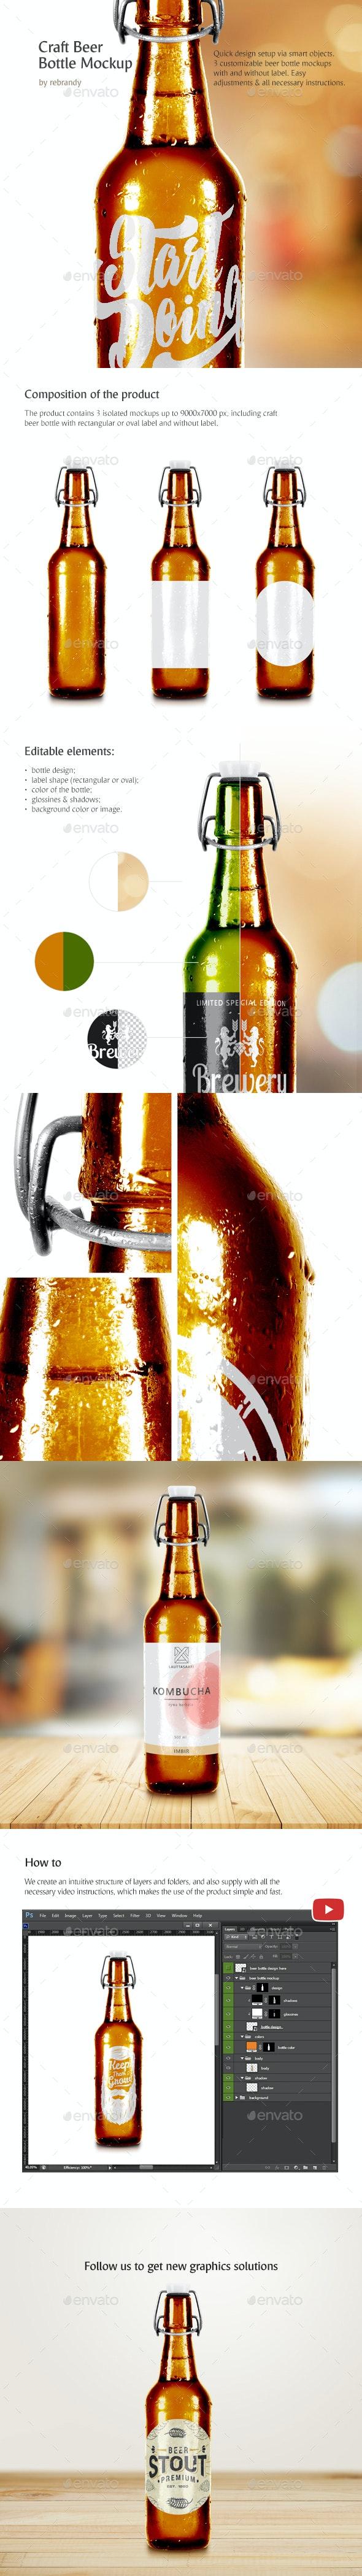 Craft Beer Bottle Mockup - Food and Drink Packaging